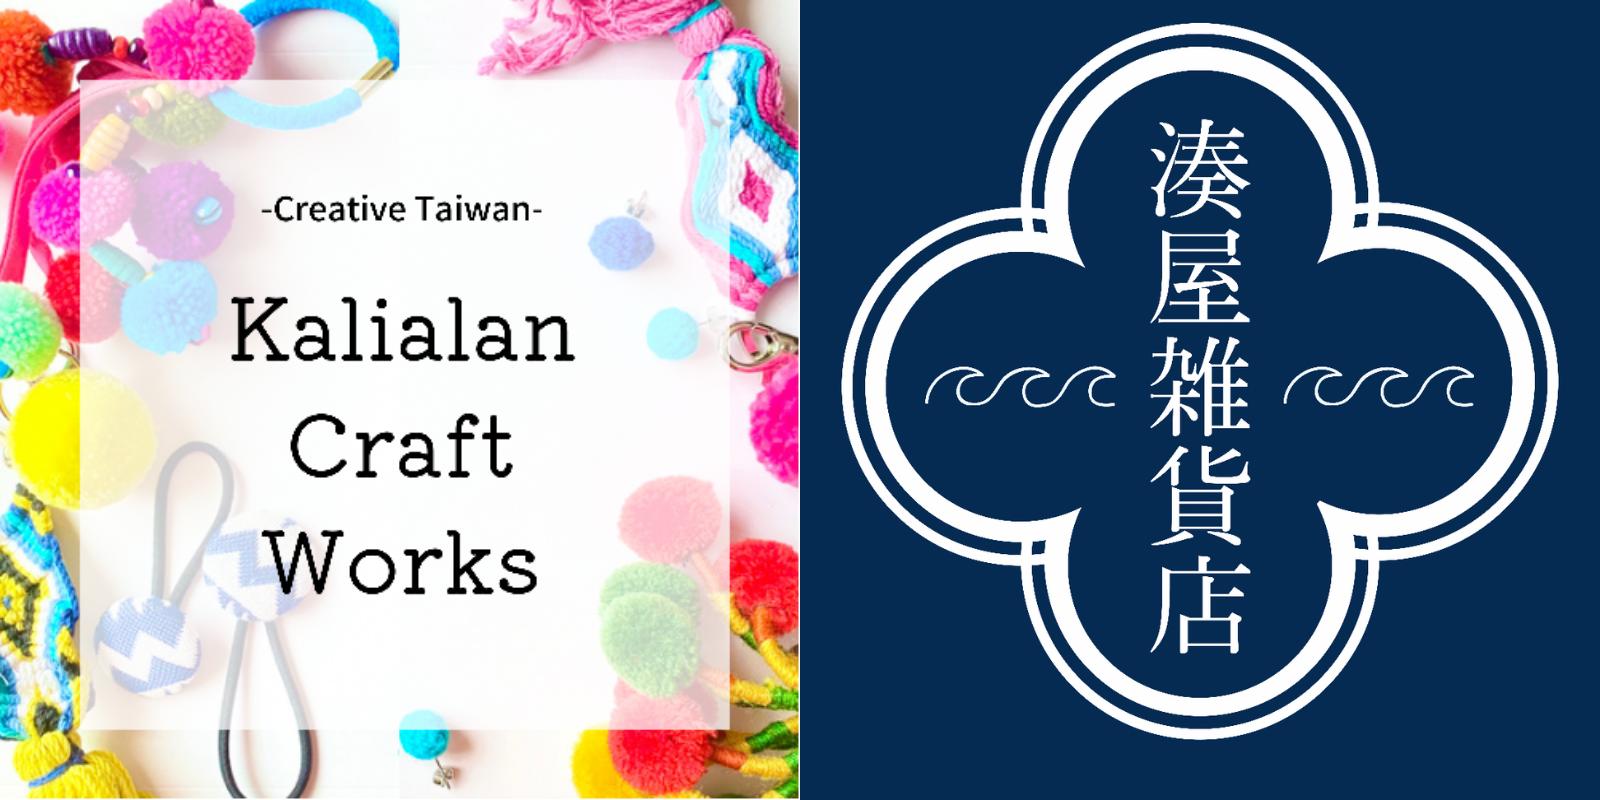 Kalialan Craft Works / 湊屋雑貨店